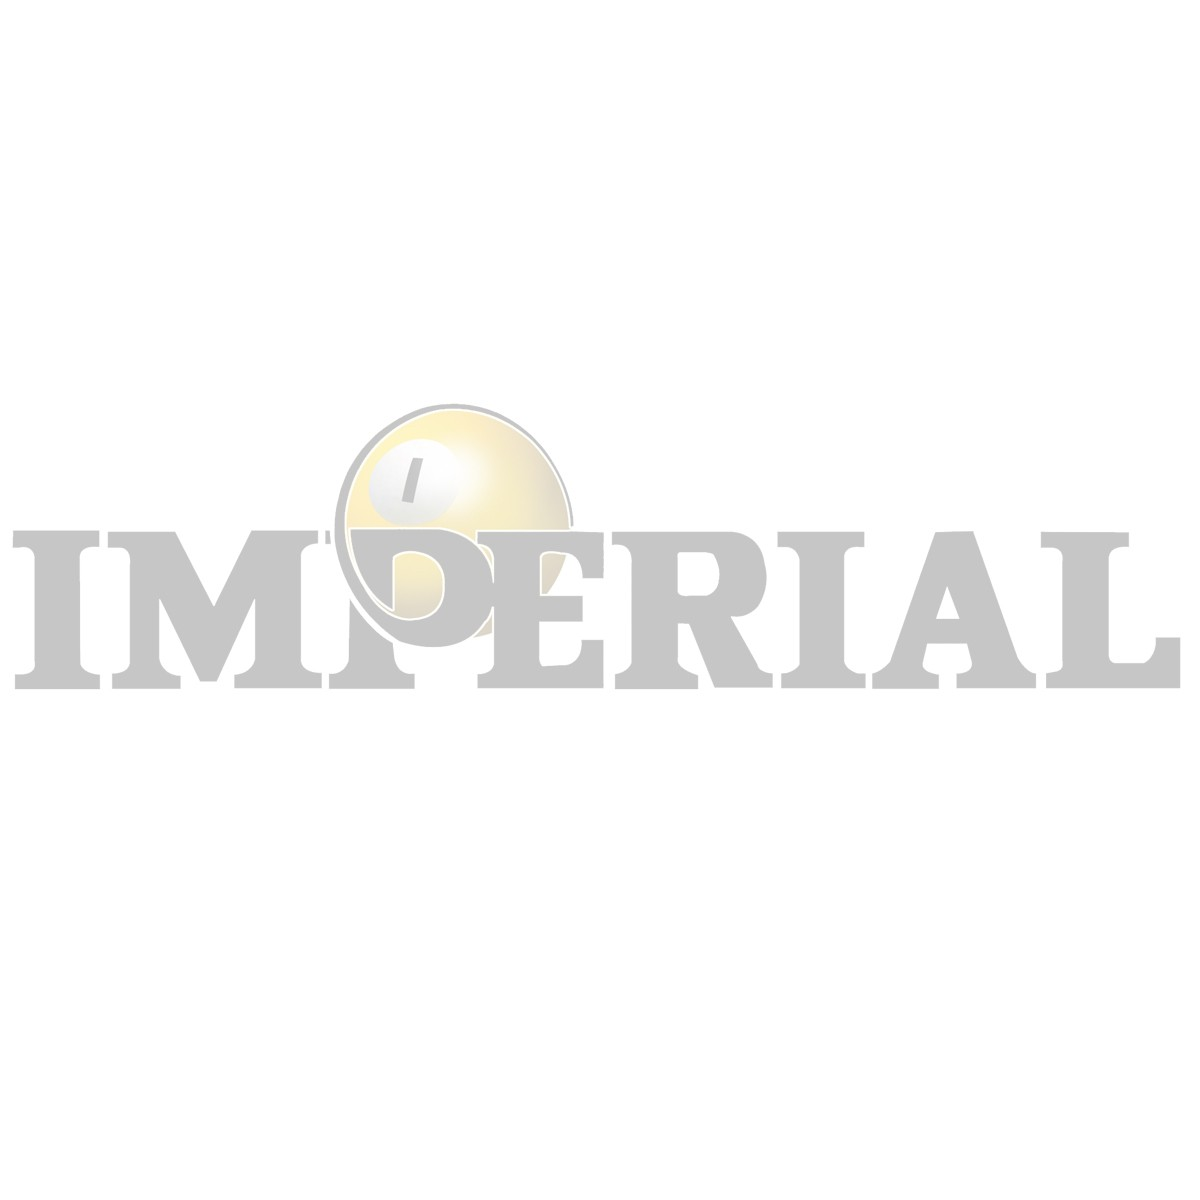 Los Angeles Chargers Home vs. Away Billiard Ball Set